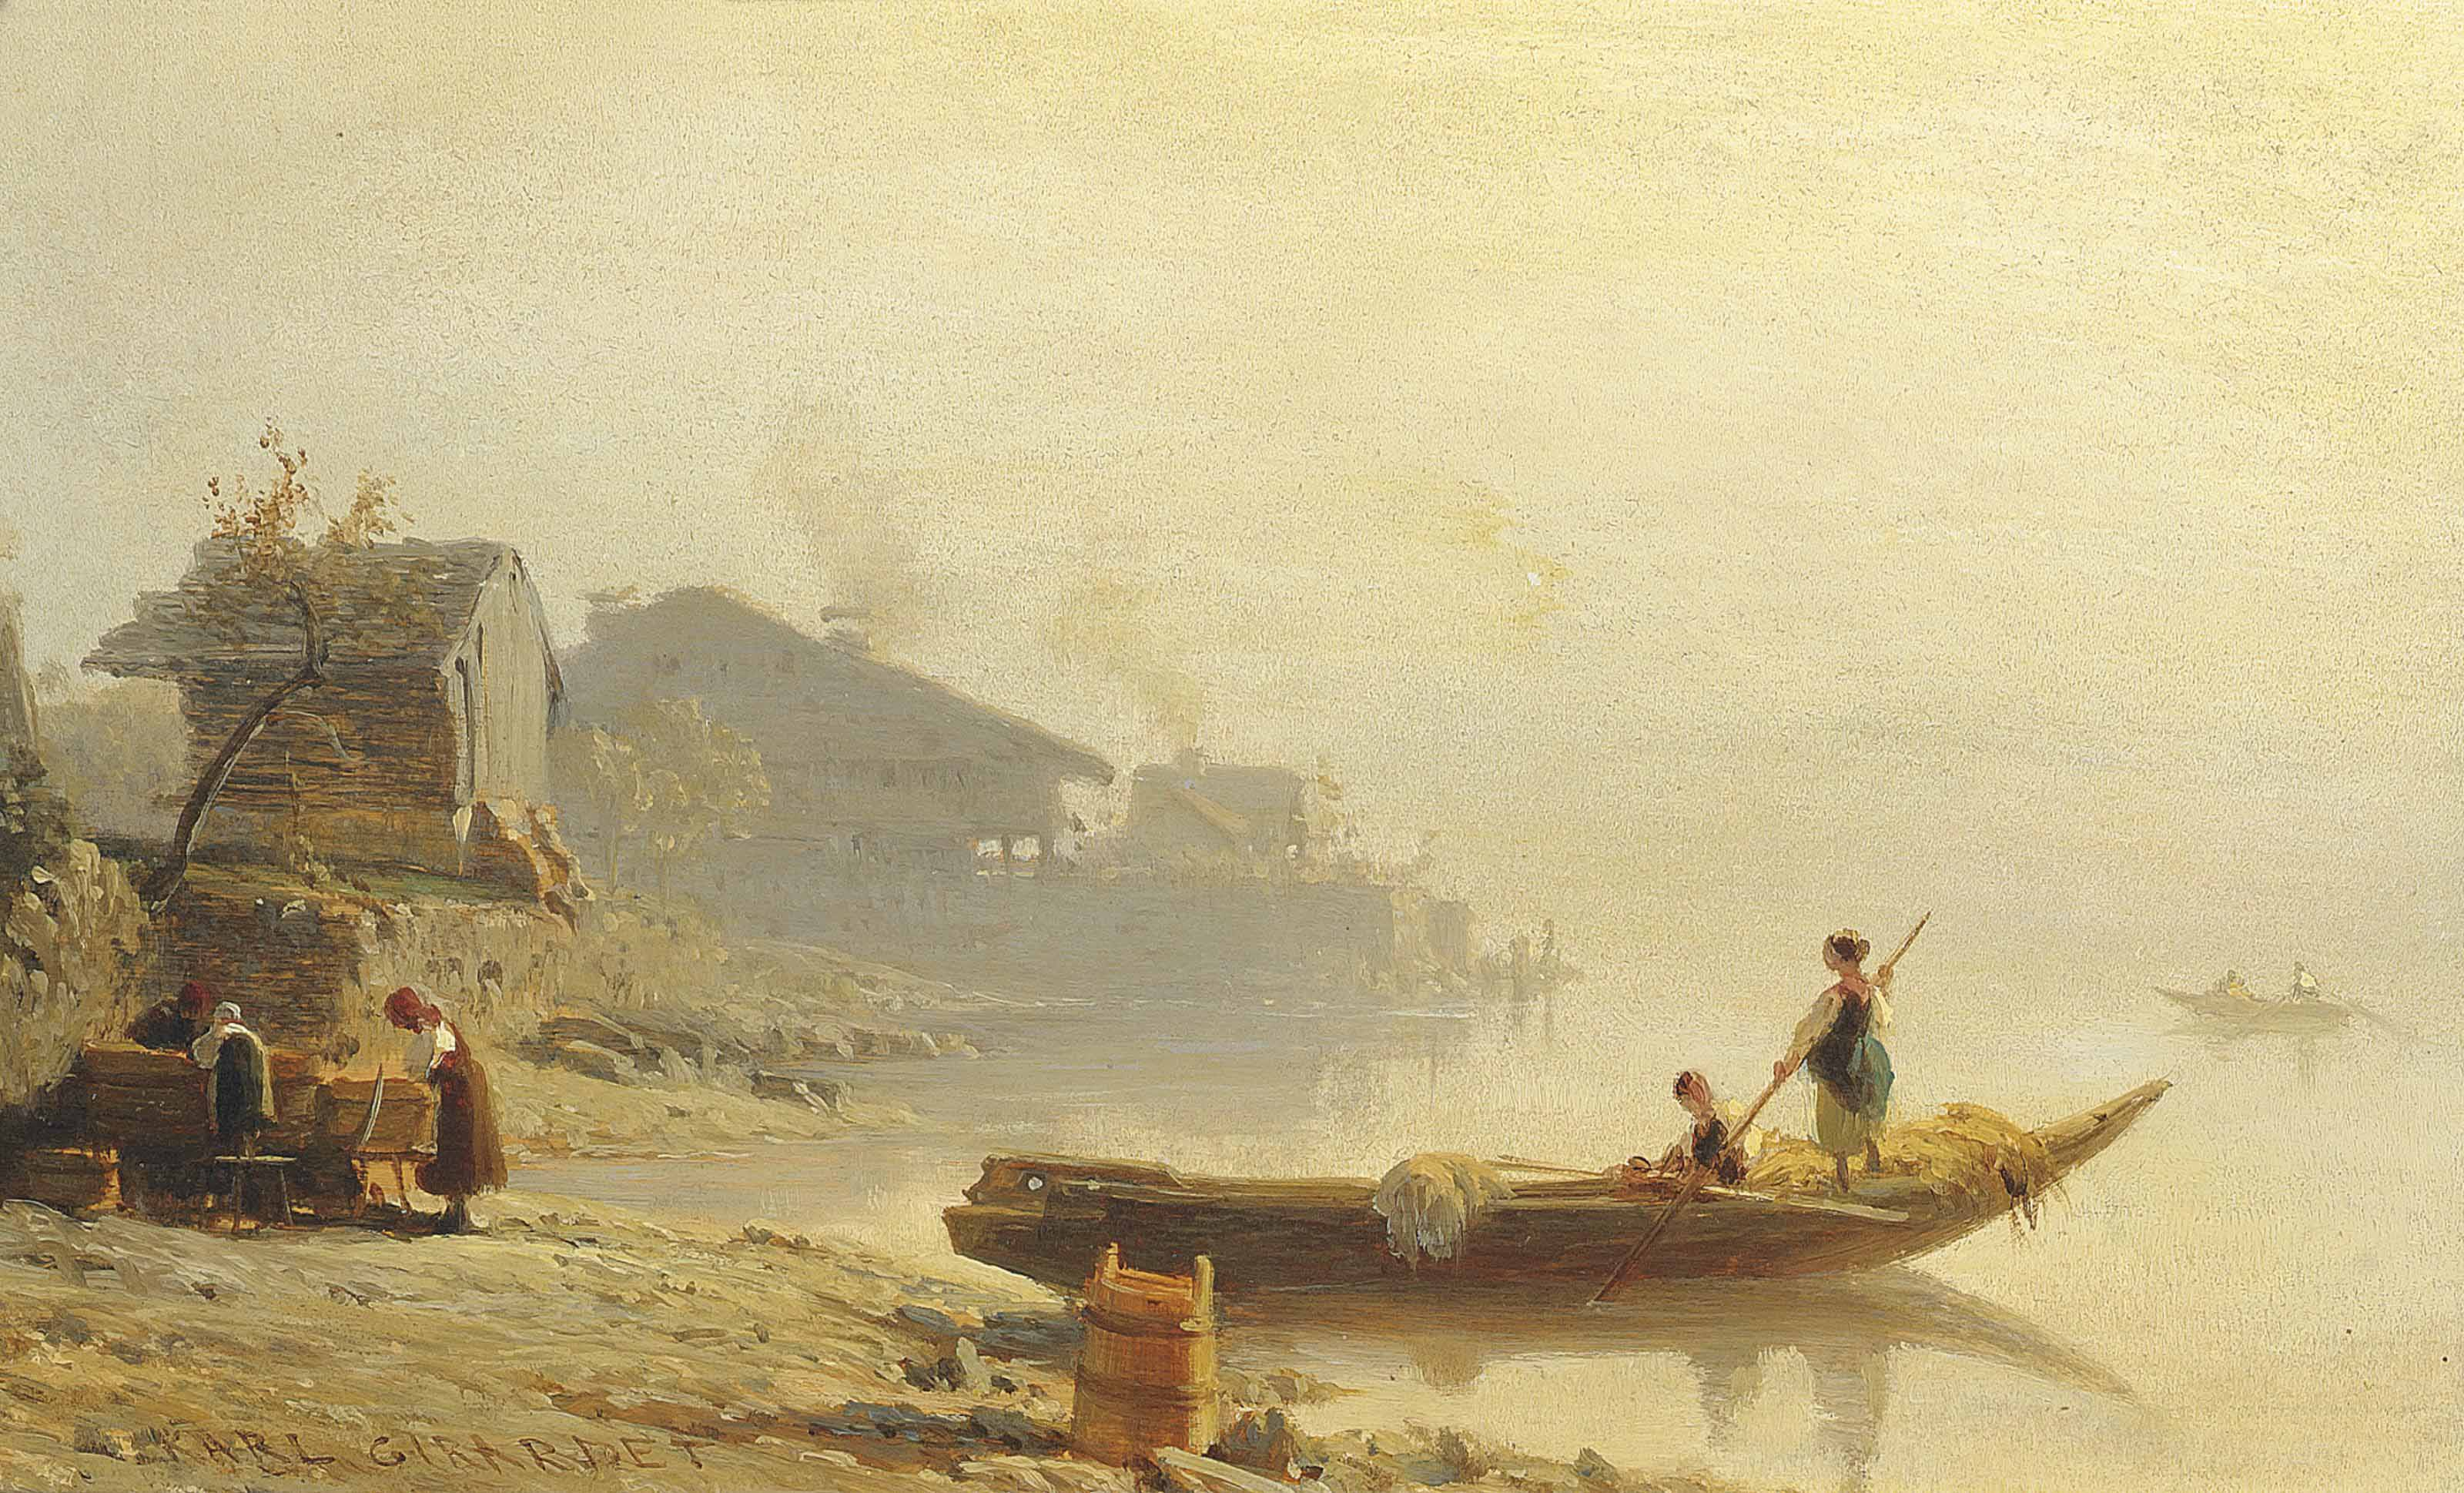 Karl Girardet (FRENCH, 1813-18